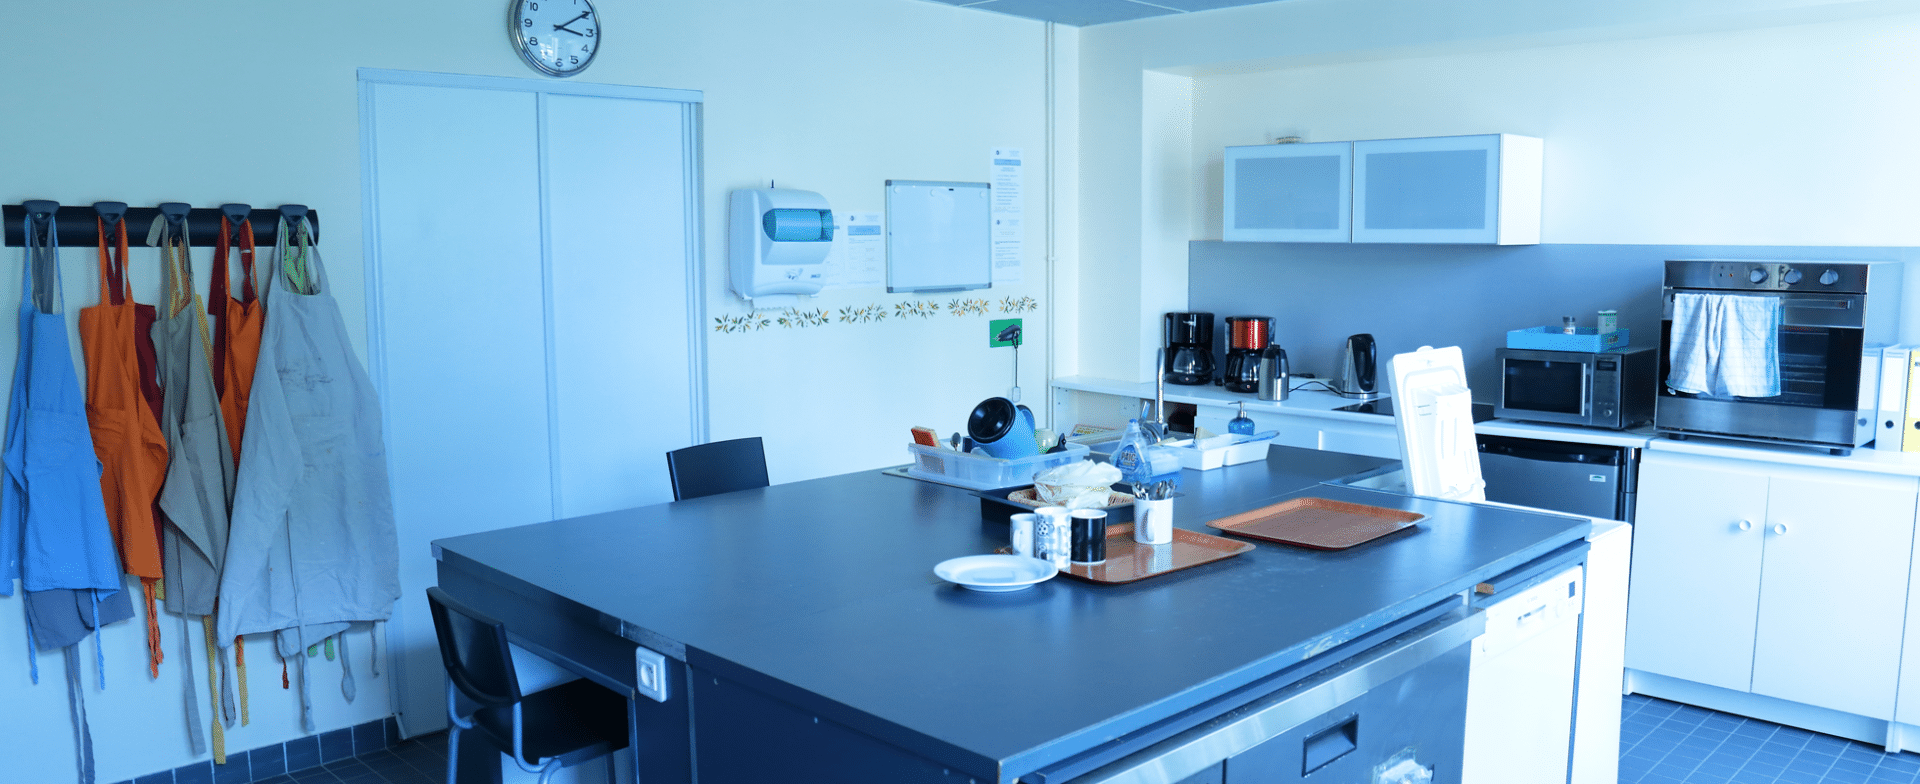 SAJH Le Mérantais espace cuisine